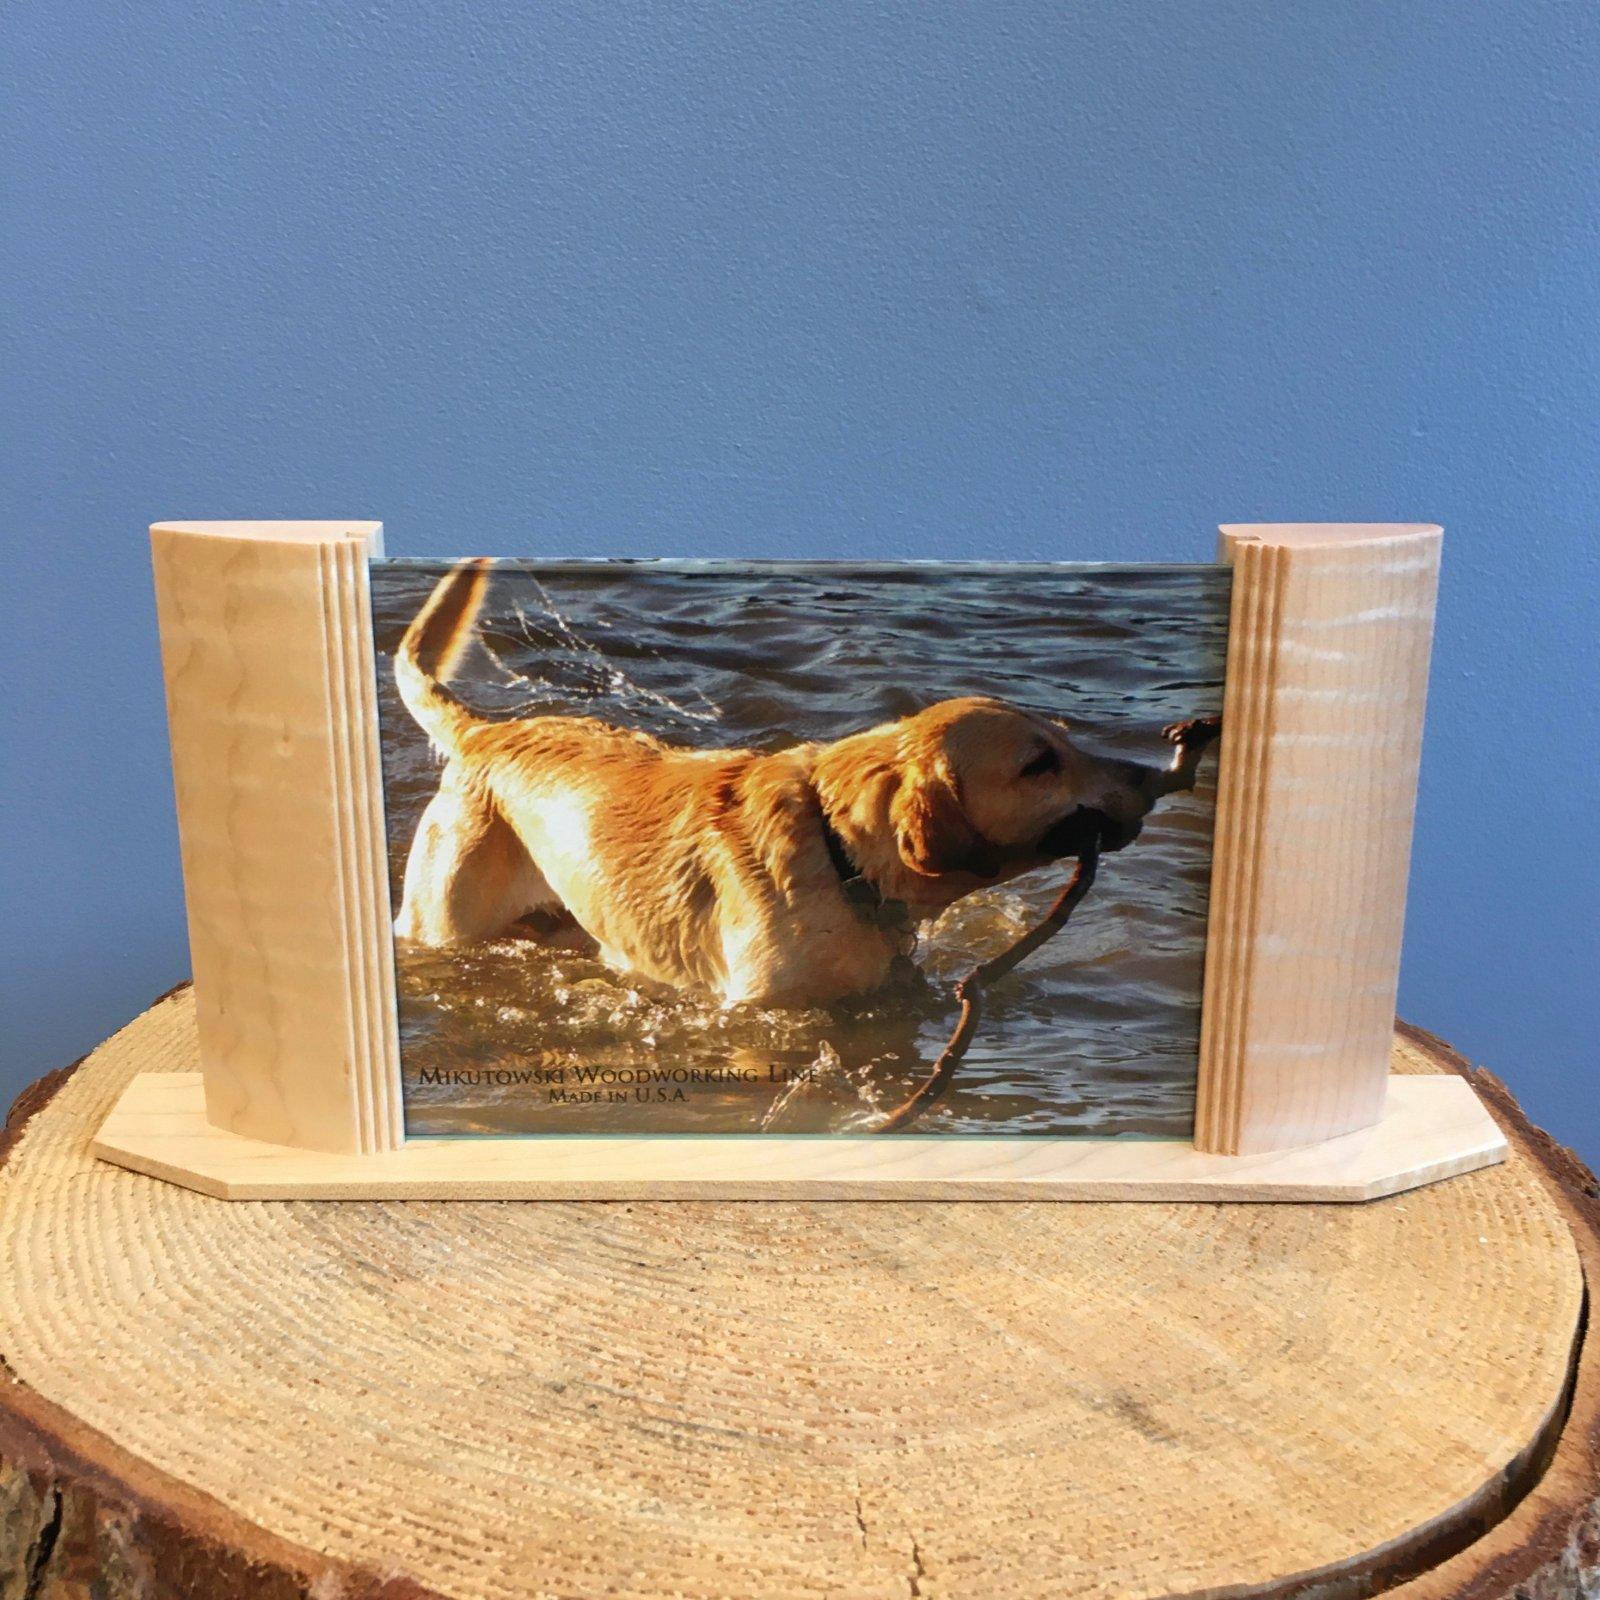 Mikutowski 5x7 Wood Frame - Curly Maple